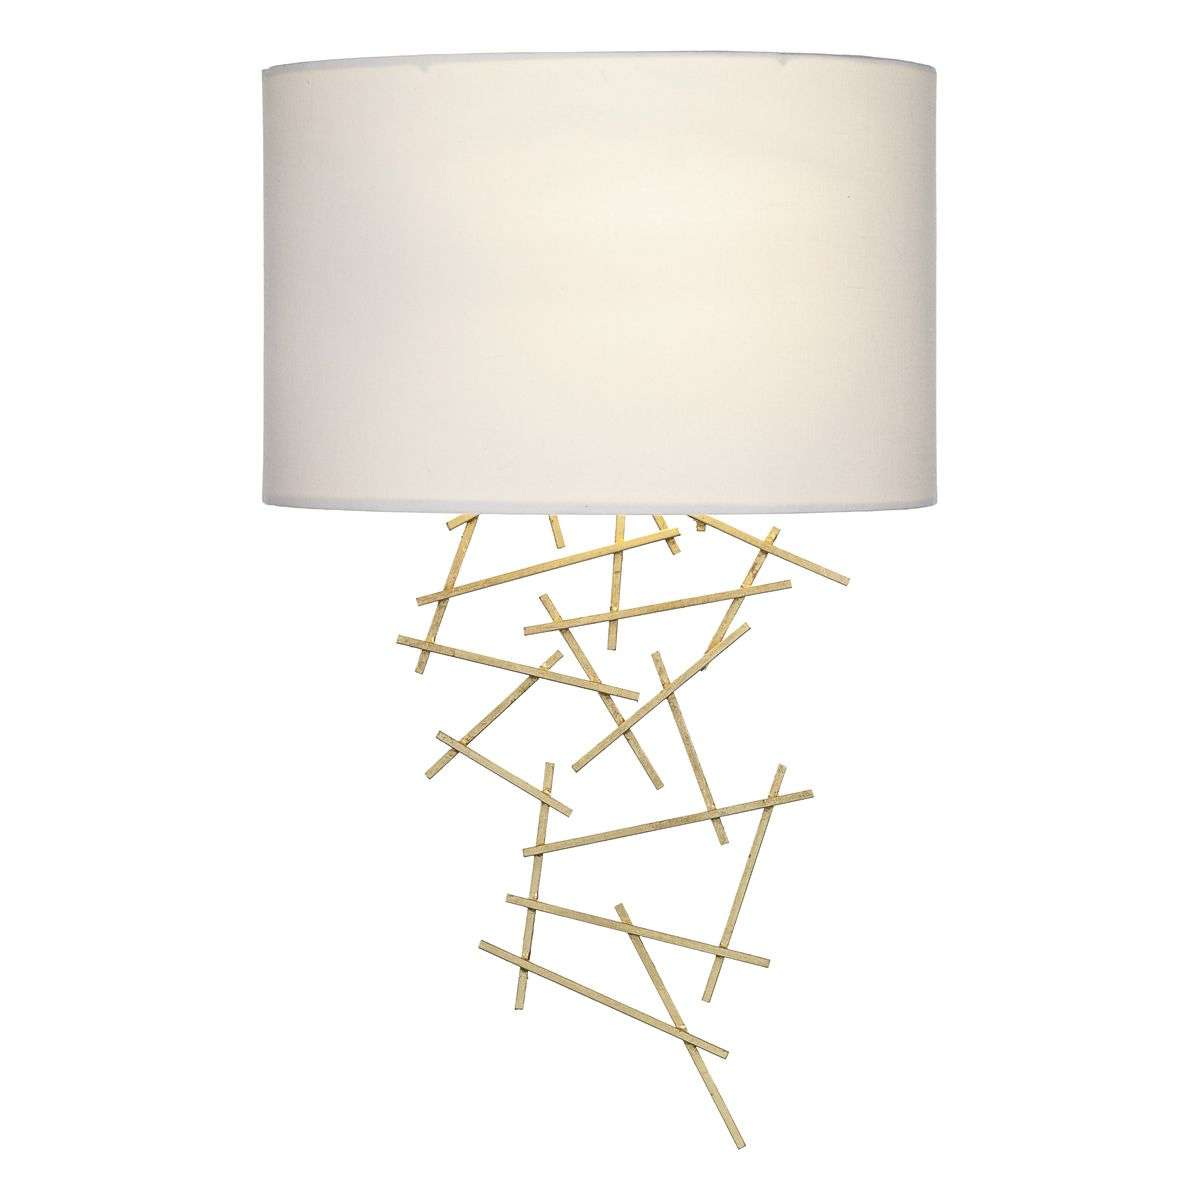 Cevero Gold Wall Light C/W Ivory Shade